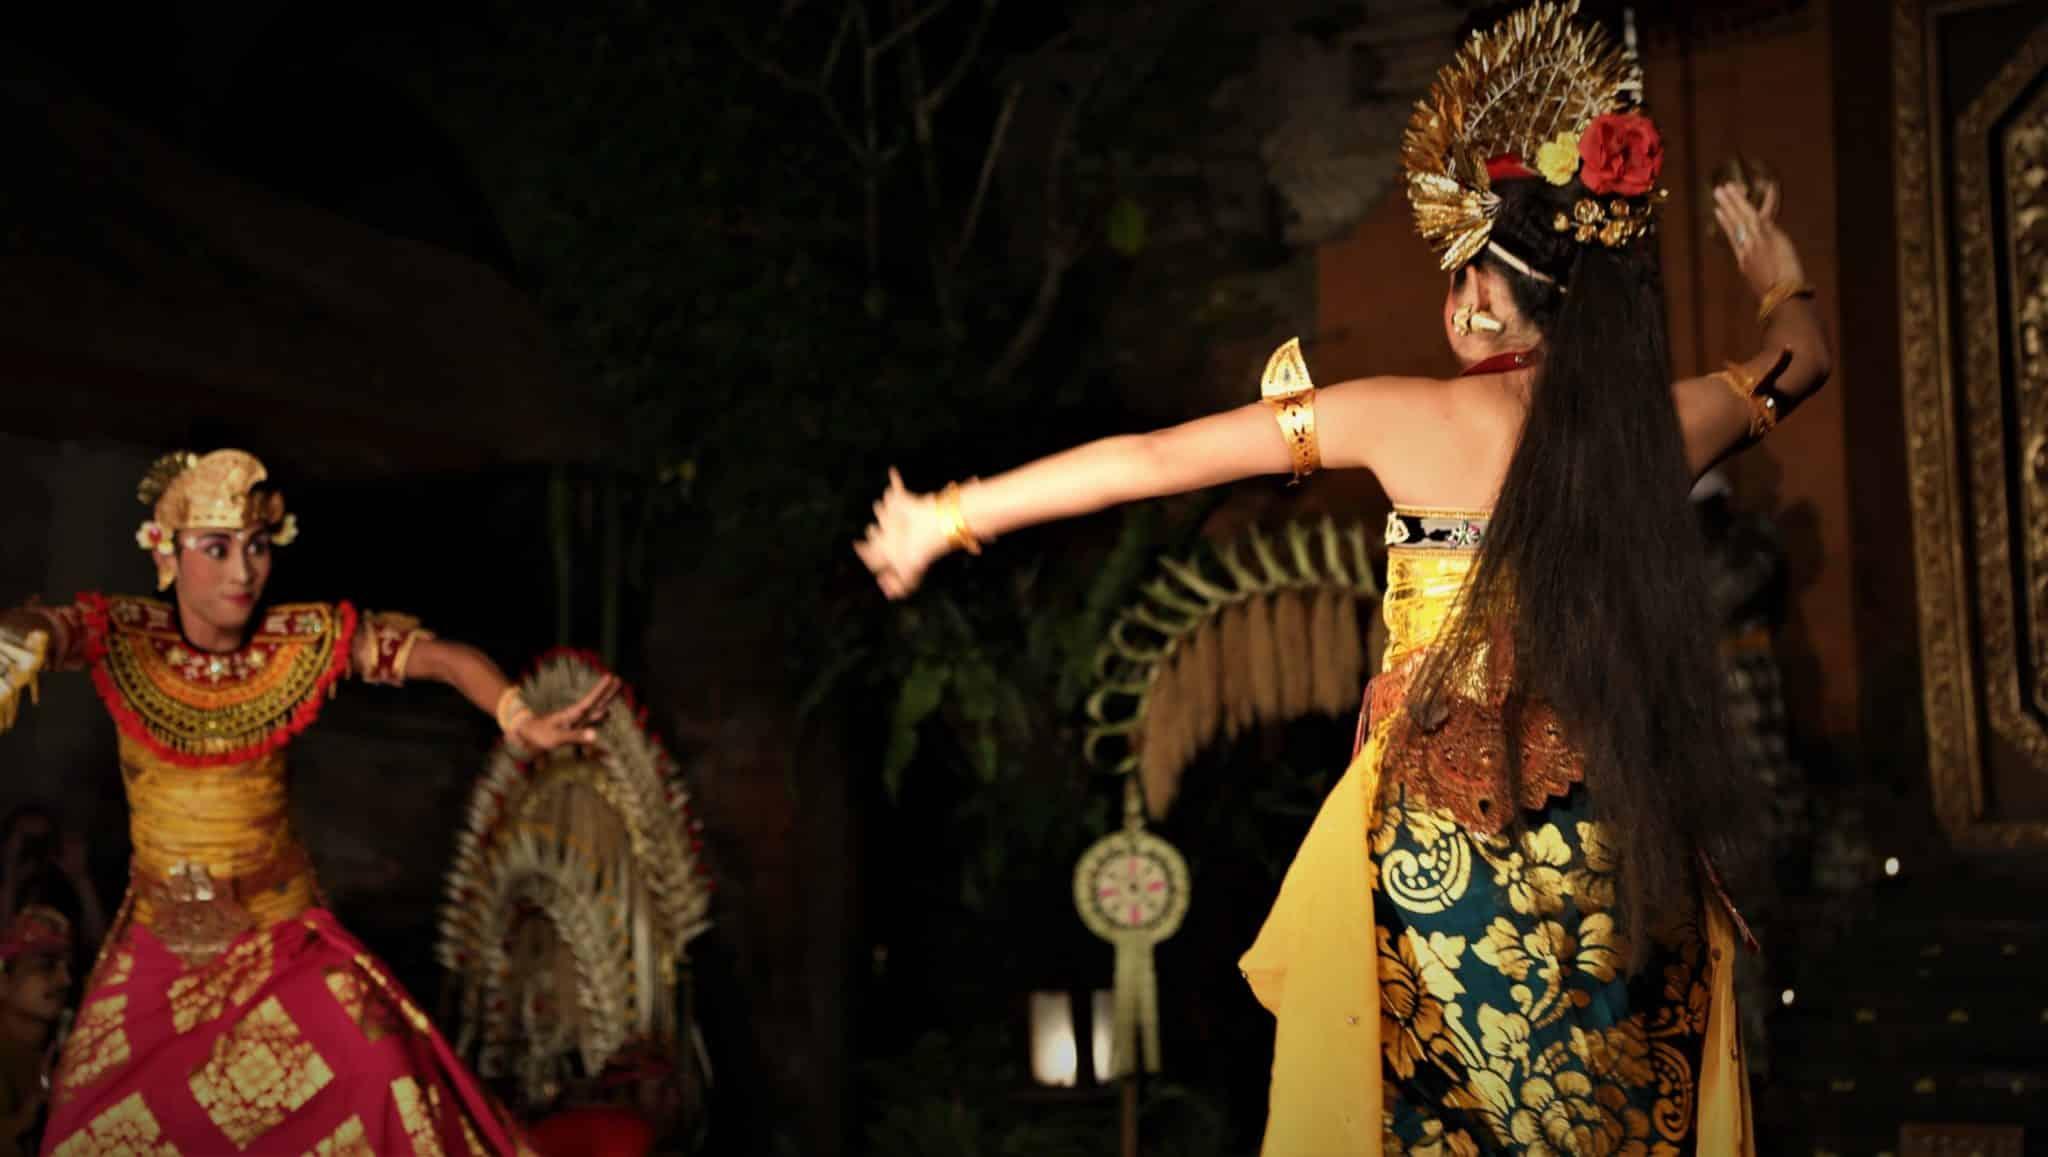 Prada Feuille d'or Danse balinaise Mes Indes Galantes Blog